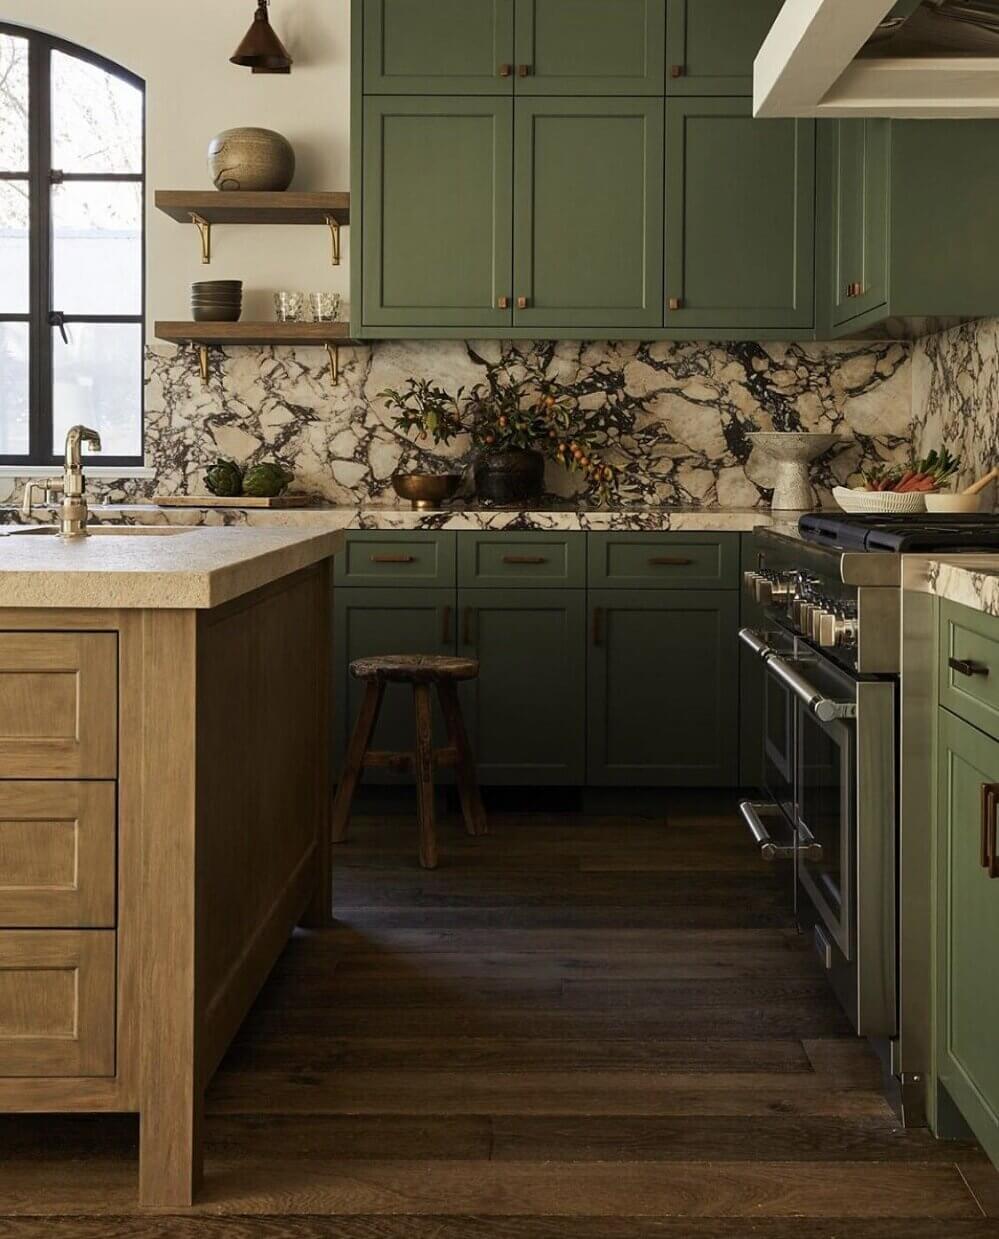 green-kitchen-cabinets-marble-countertop-backsplash-nordroom